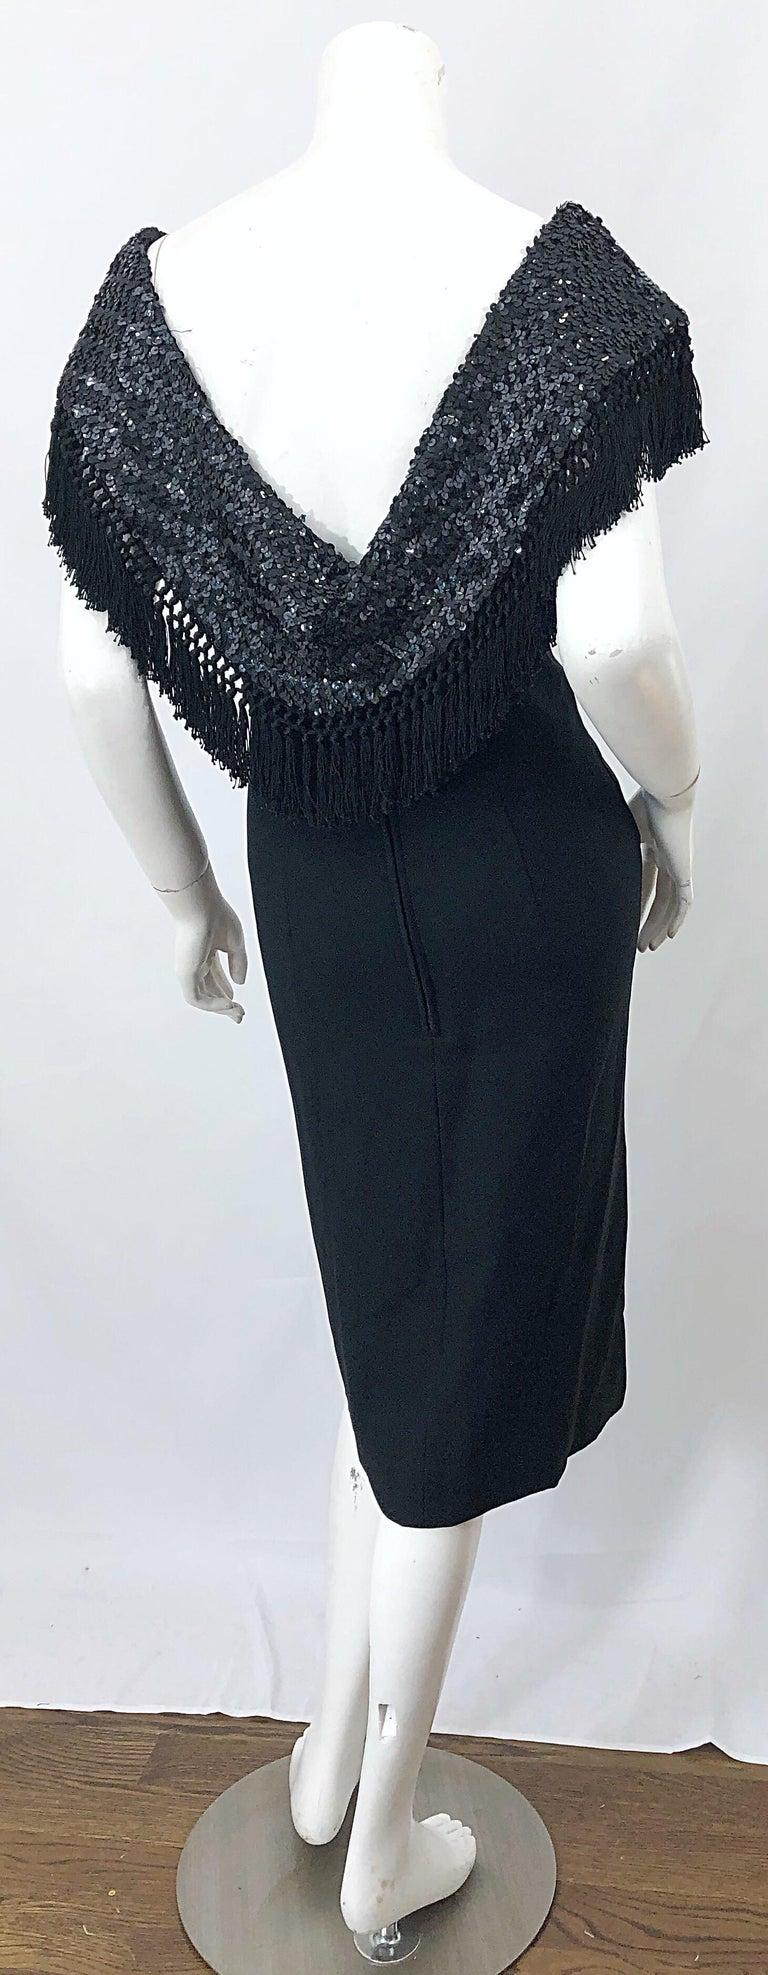 1950s Demi Couture Black Silk Crepe Dramatic Sequin Neck Fringe Vintage Dress For Sale 7